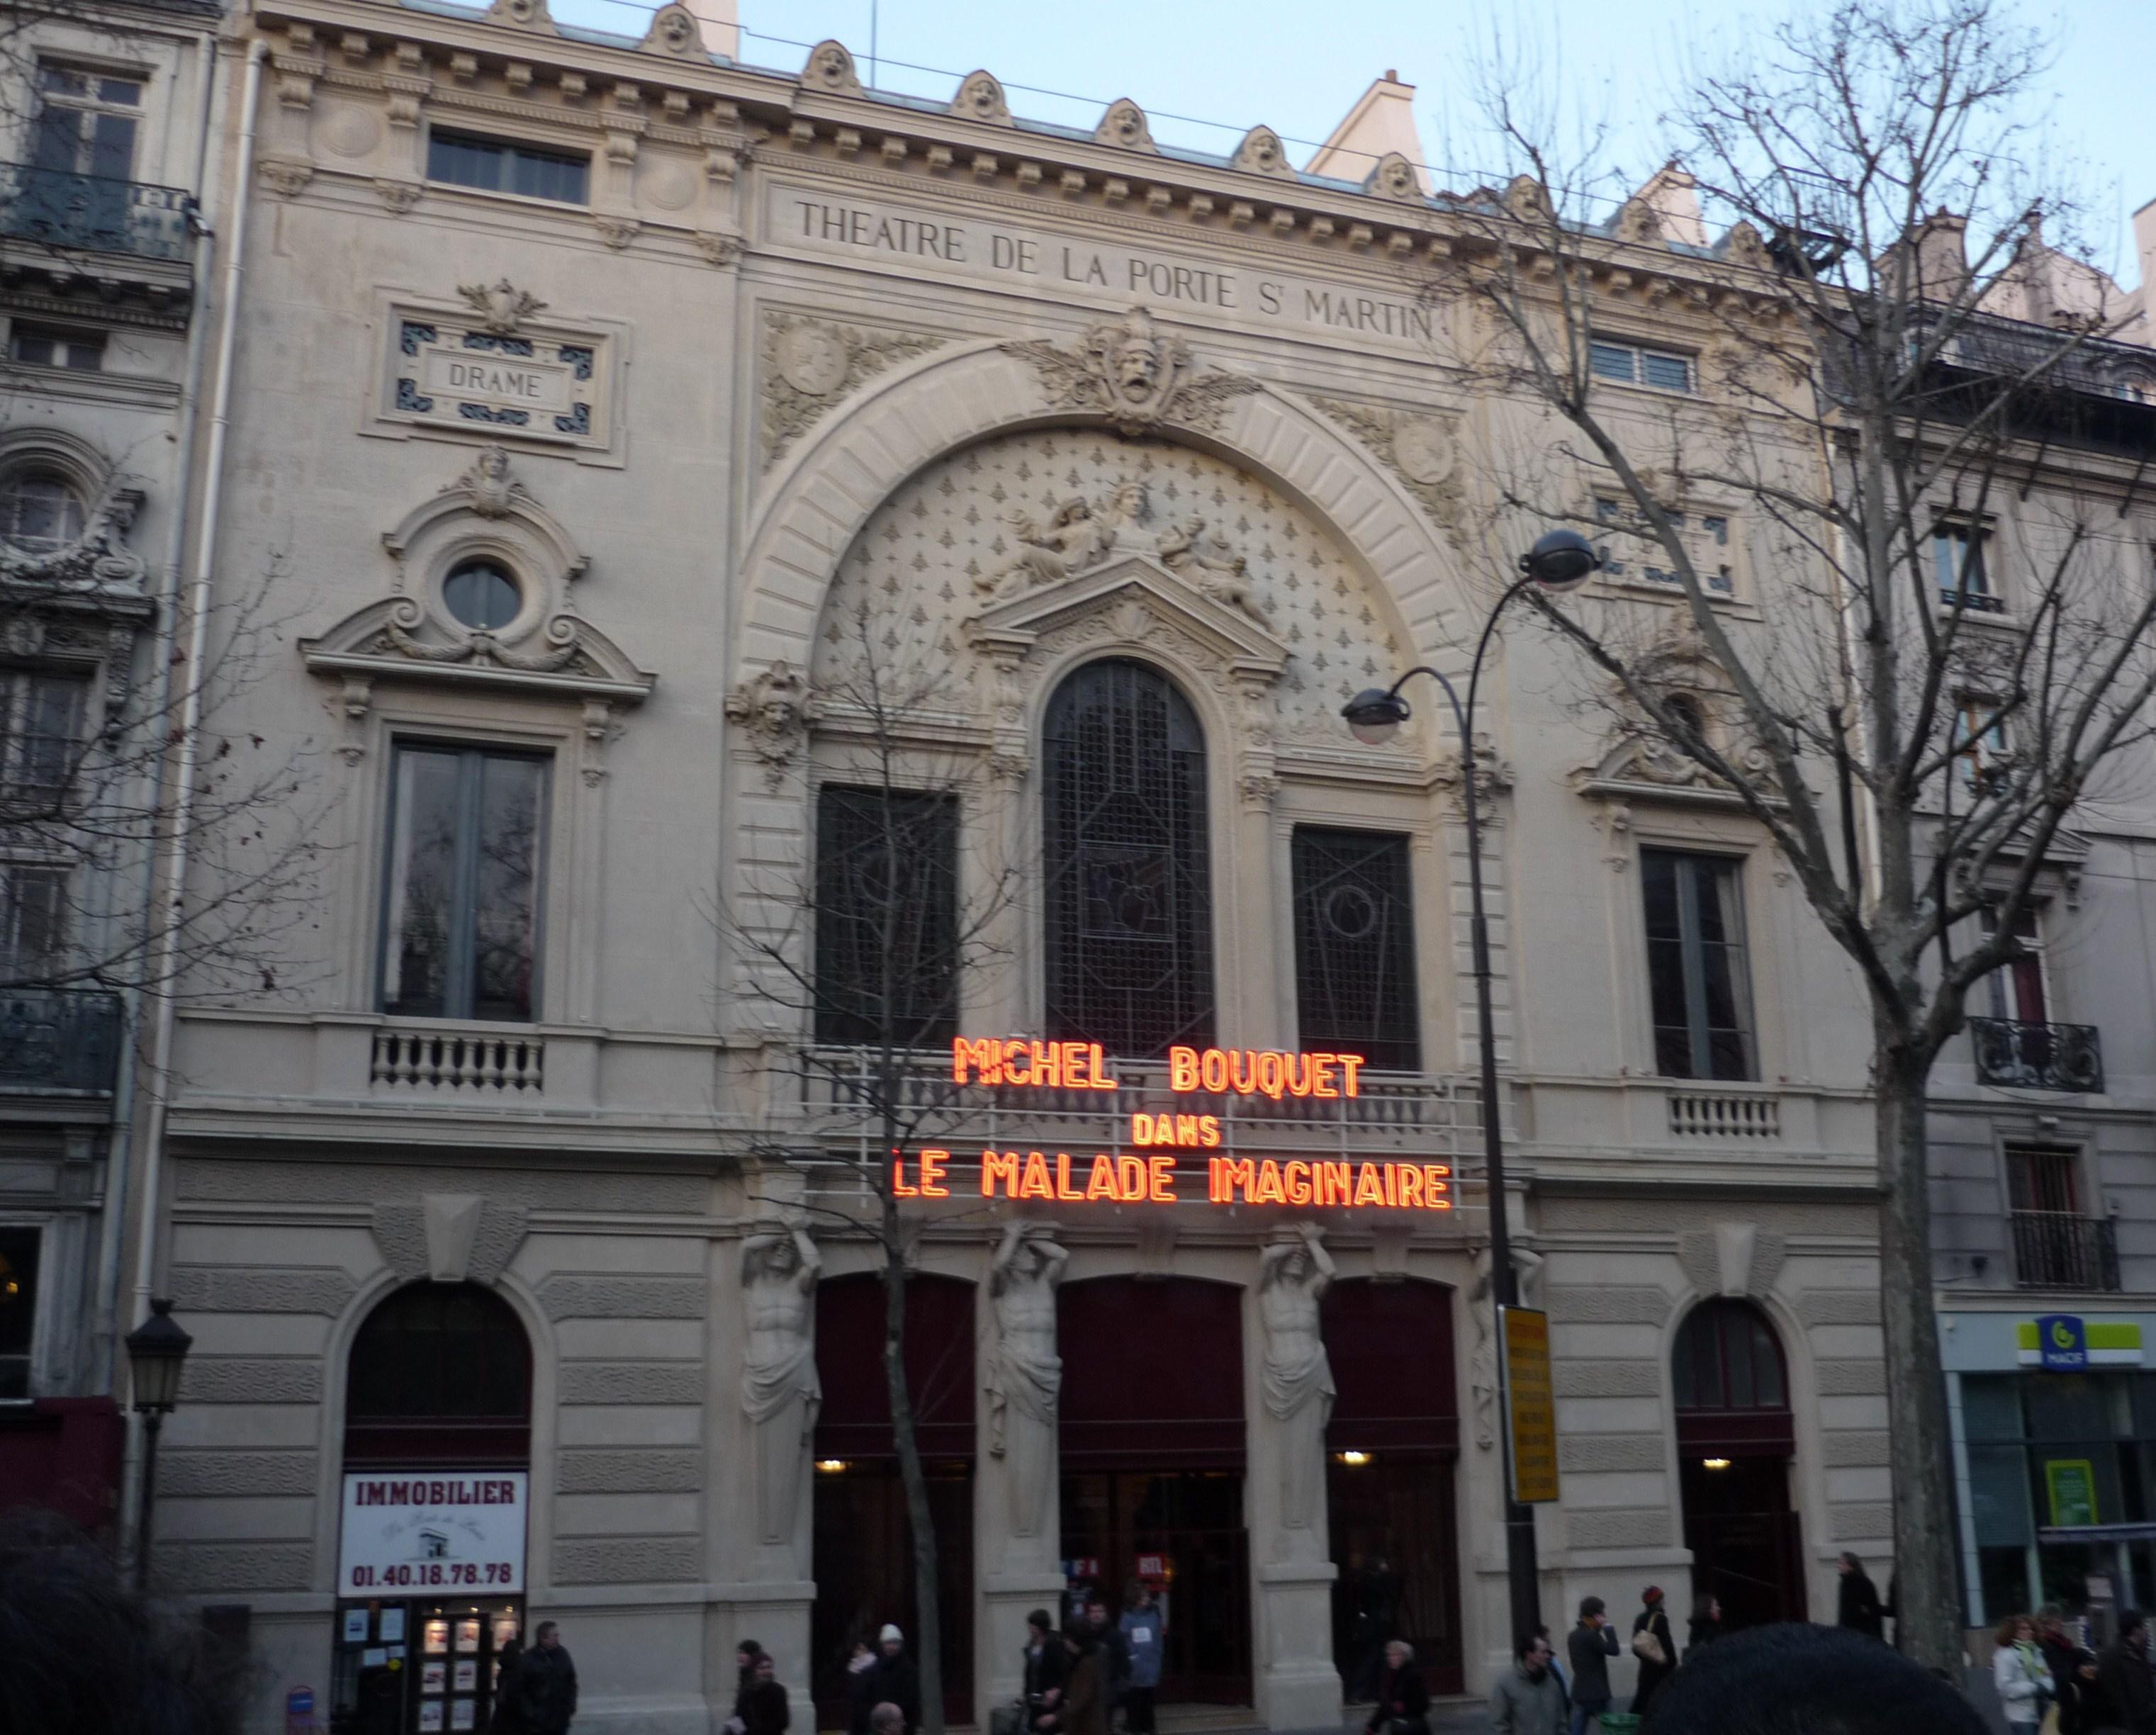 Theatre de la porte saint martin - Theatre de la porte saint martin plan ...